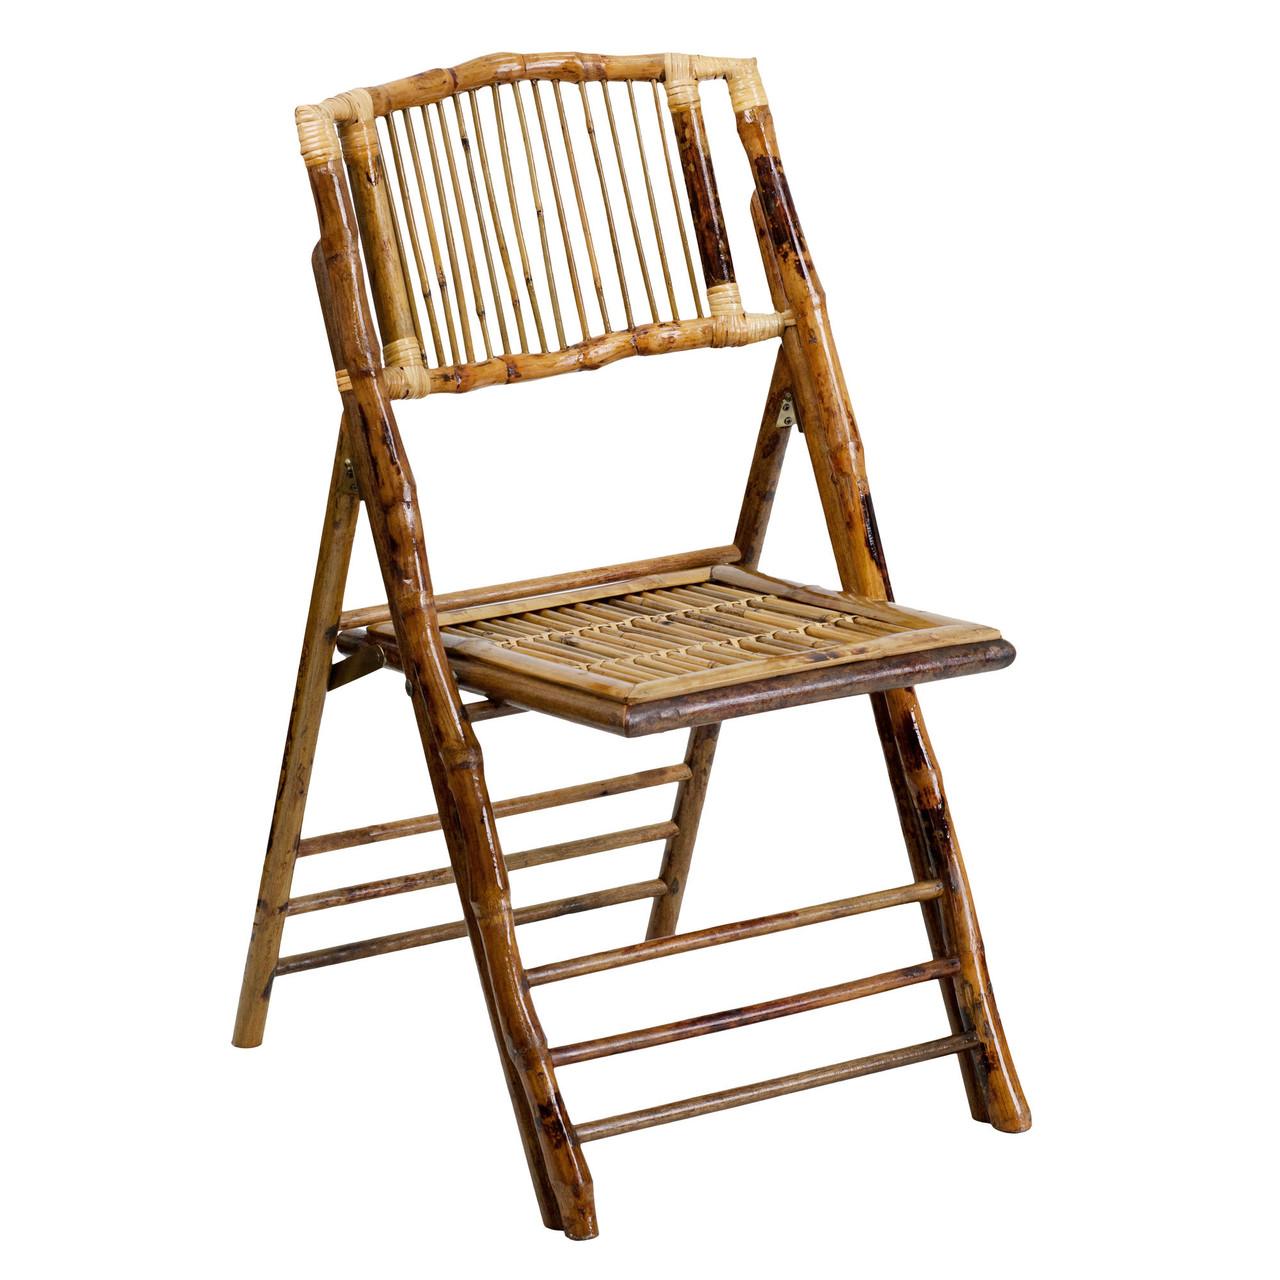 Astonishing Advantage Bamboo Wooden Folding Chairs X 62111 Bam Gg Ncnpc Chair Design For Home Ncnpcorg